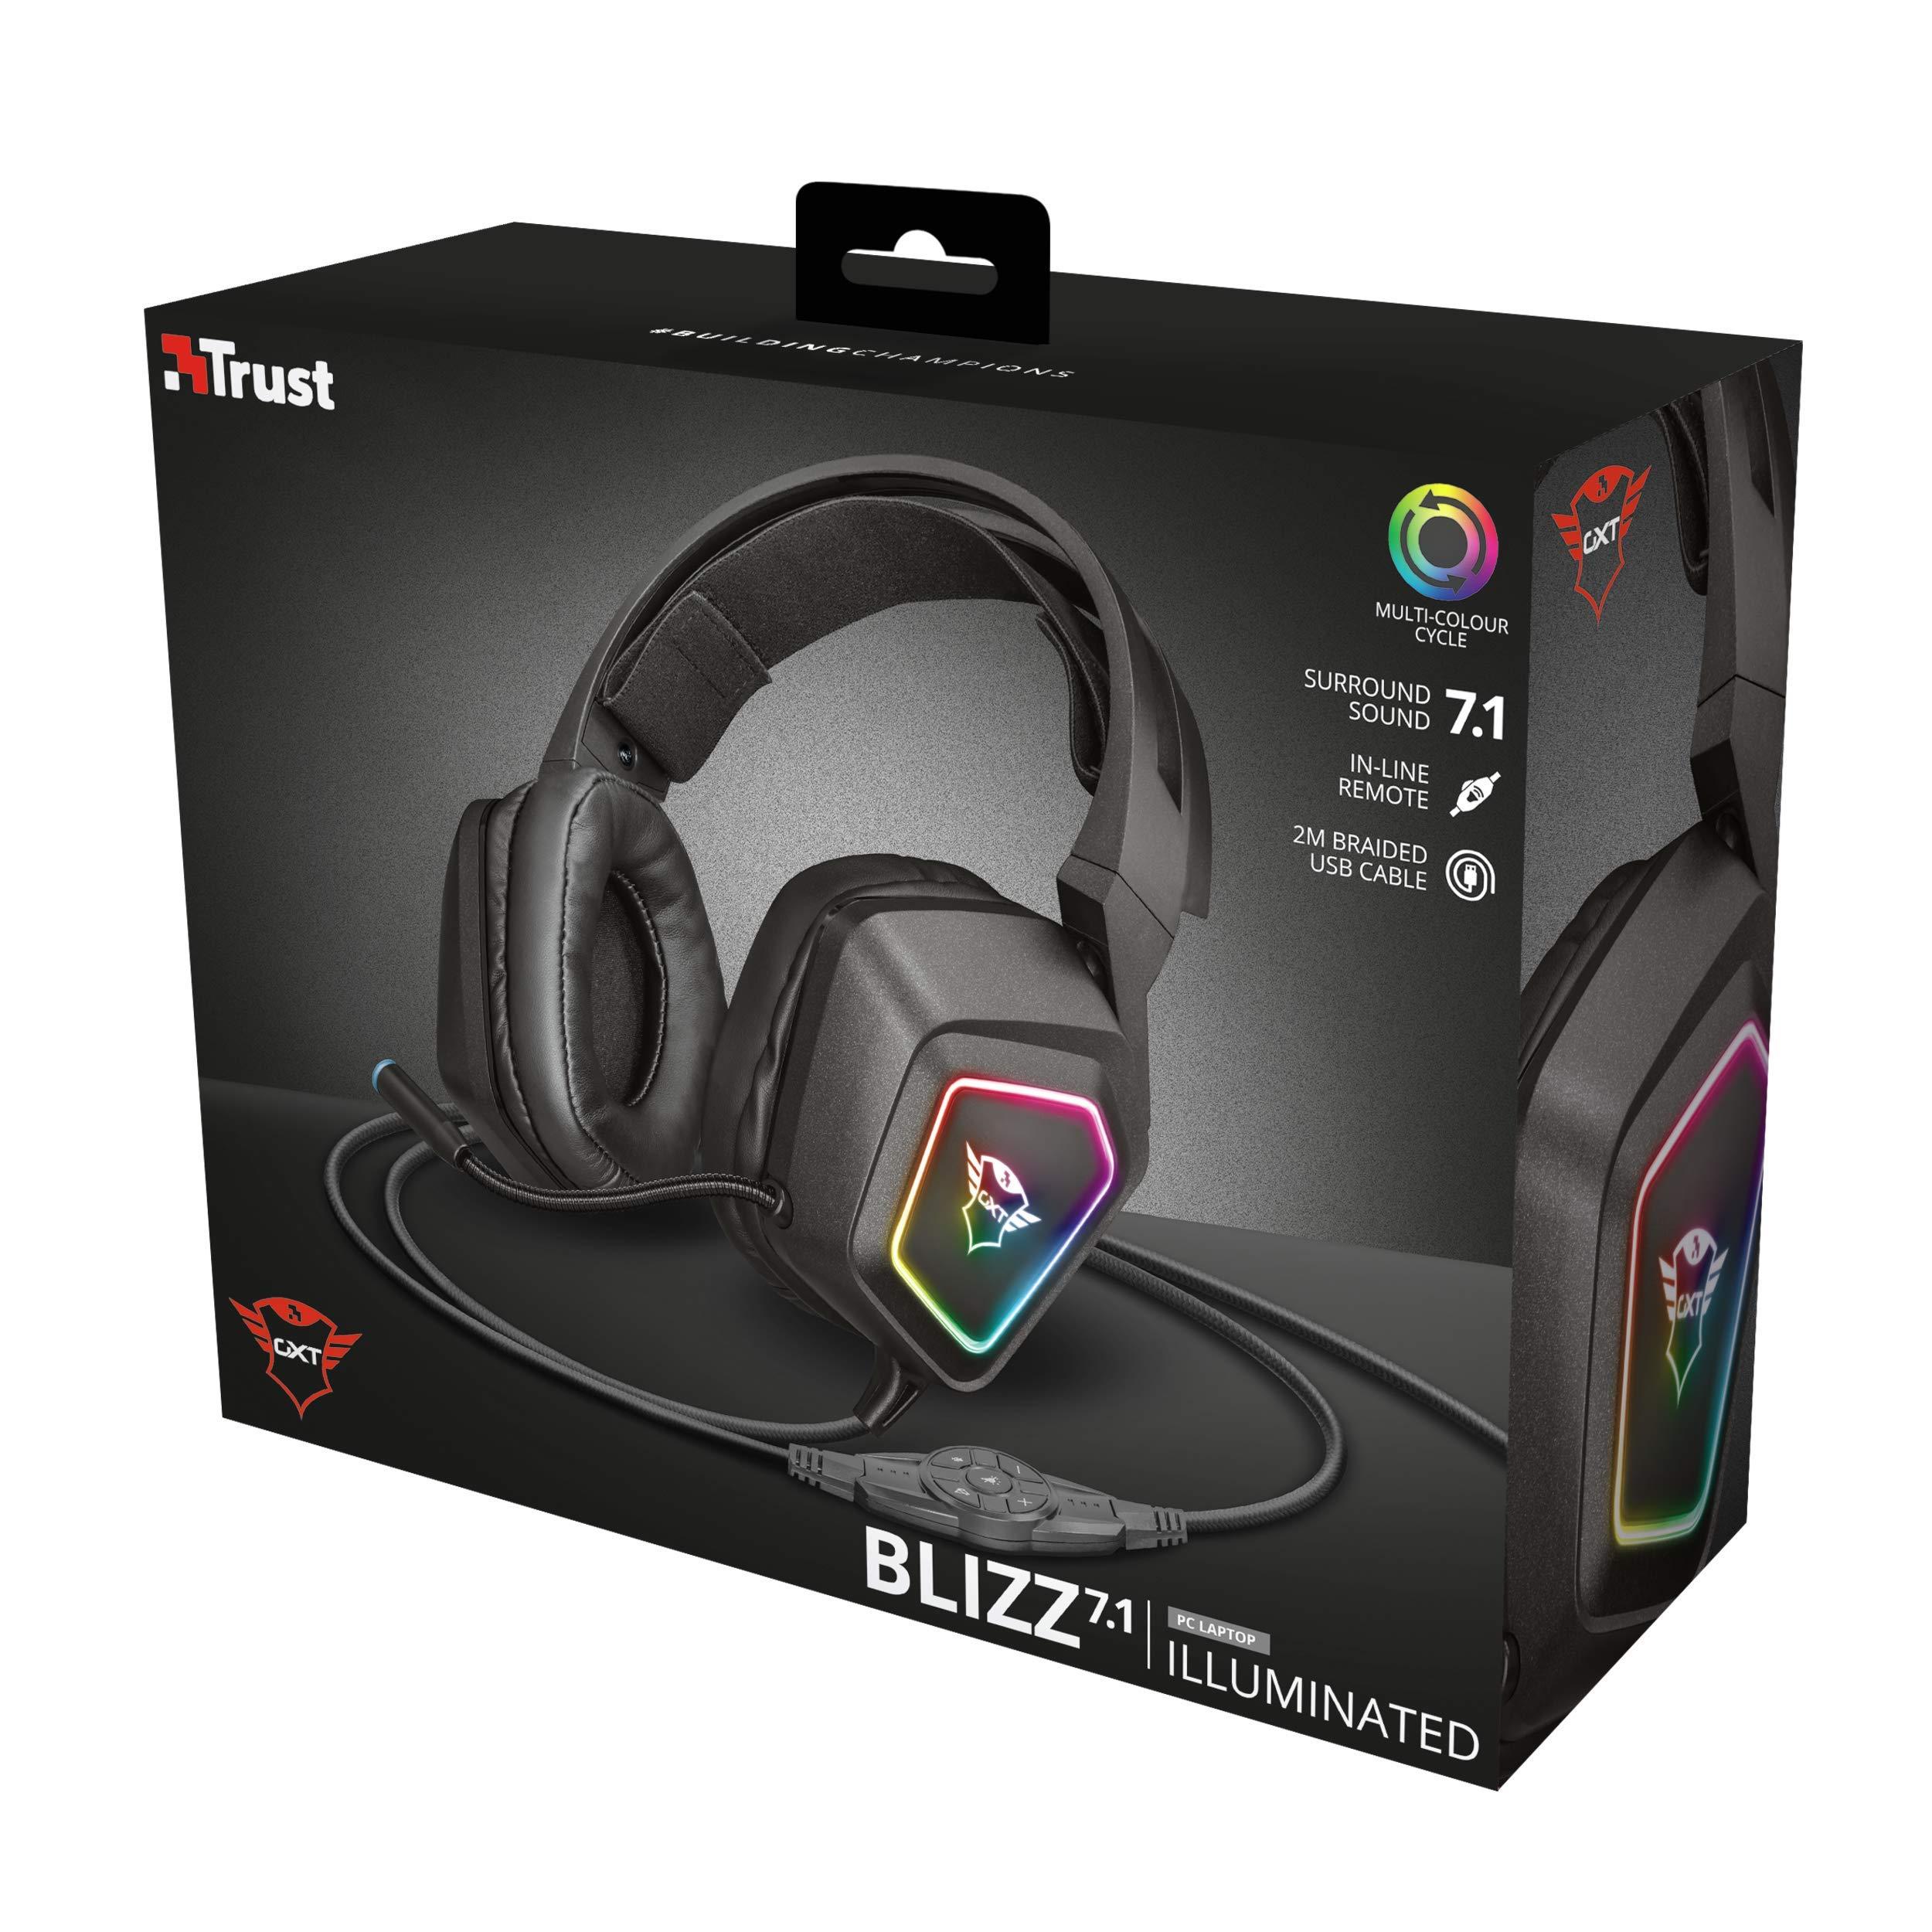 Amazon.co.uk: Trust Gaming: Headsets